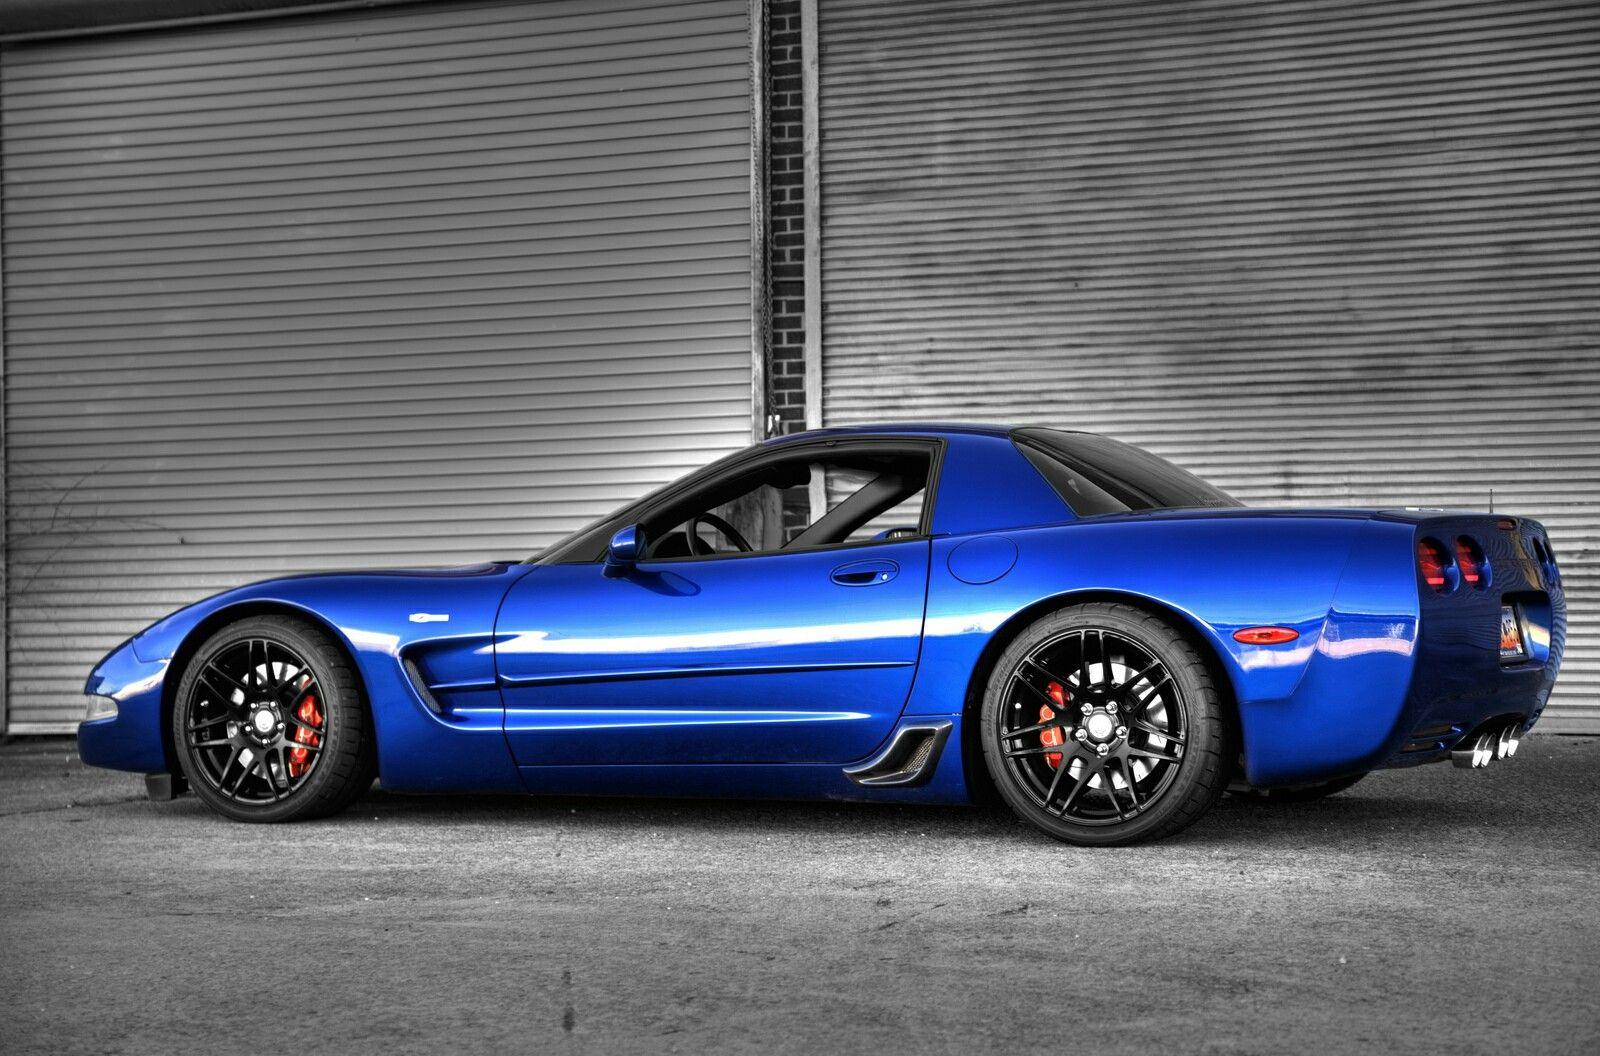 Pin By Jay Low On Usdm Muscle 2003 Corvette Corvette Z06 Chevy Corvette